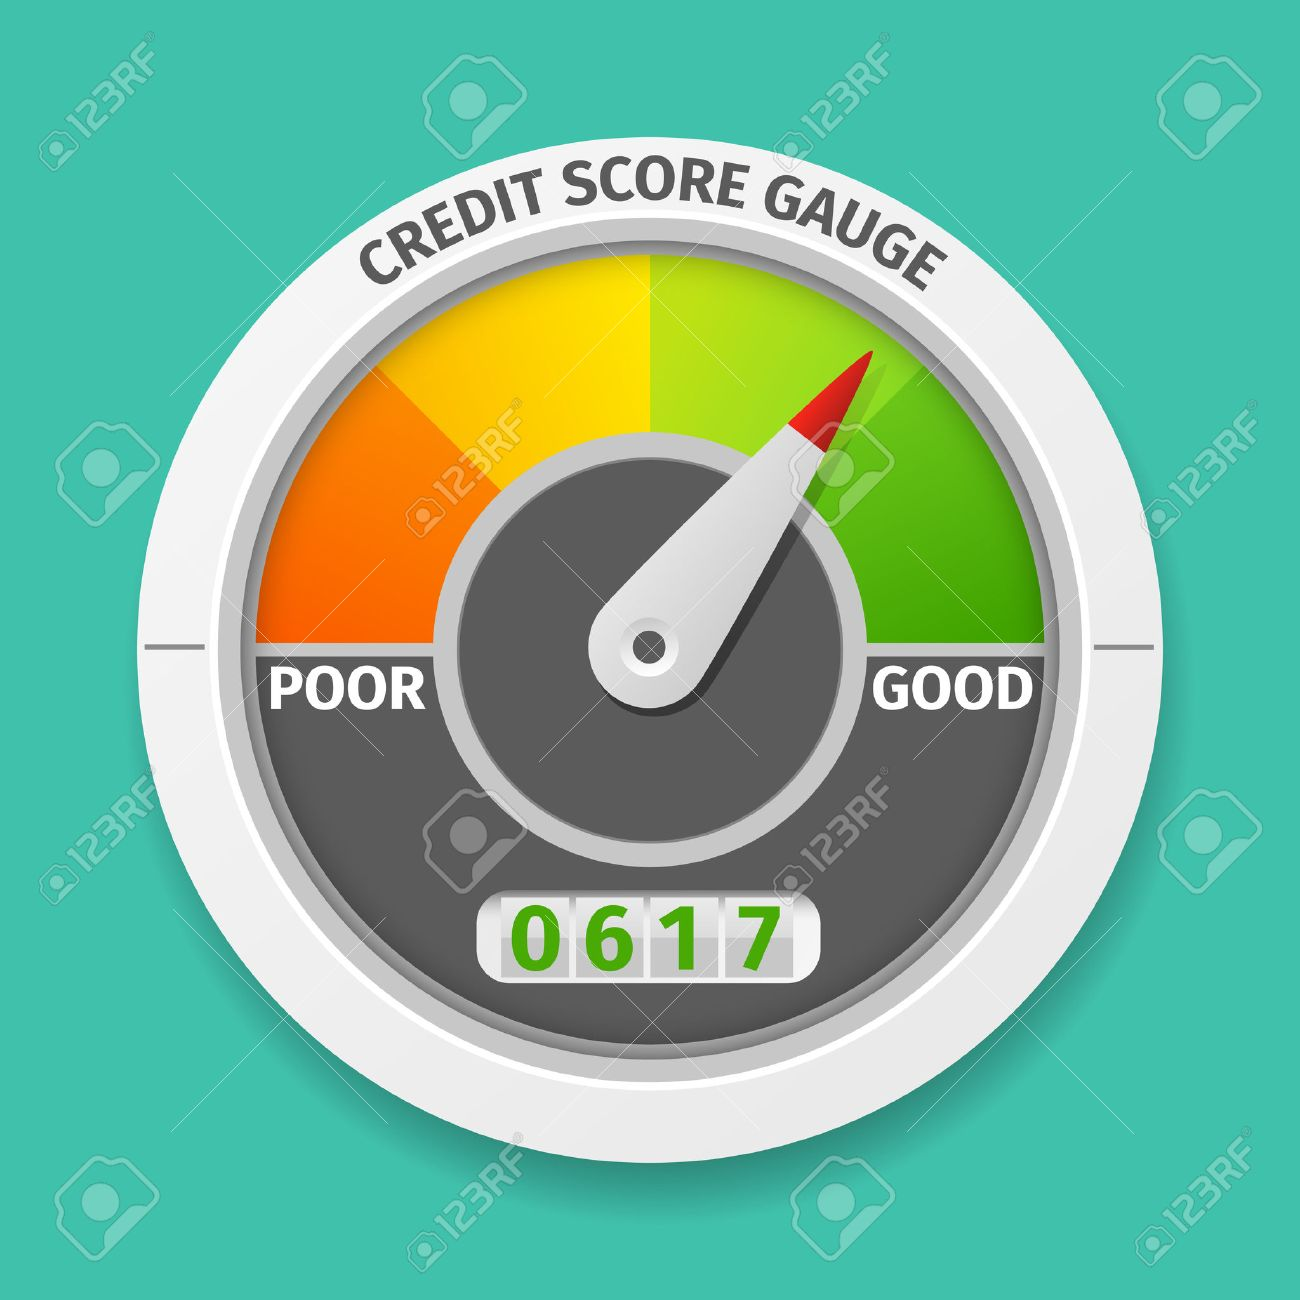 Furniture Design Royalty Rates credit score gauge good and bad rating, information financial